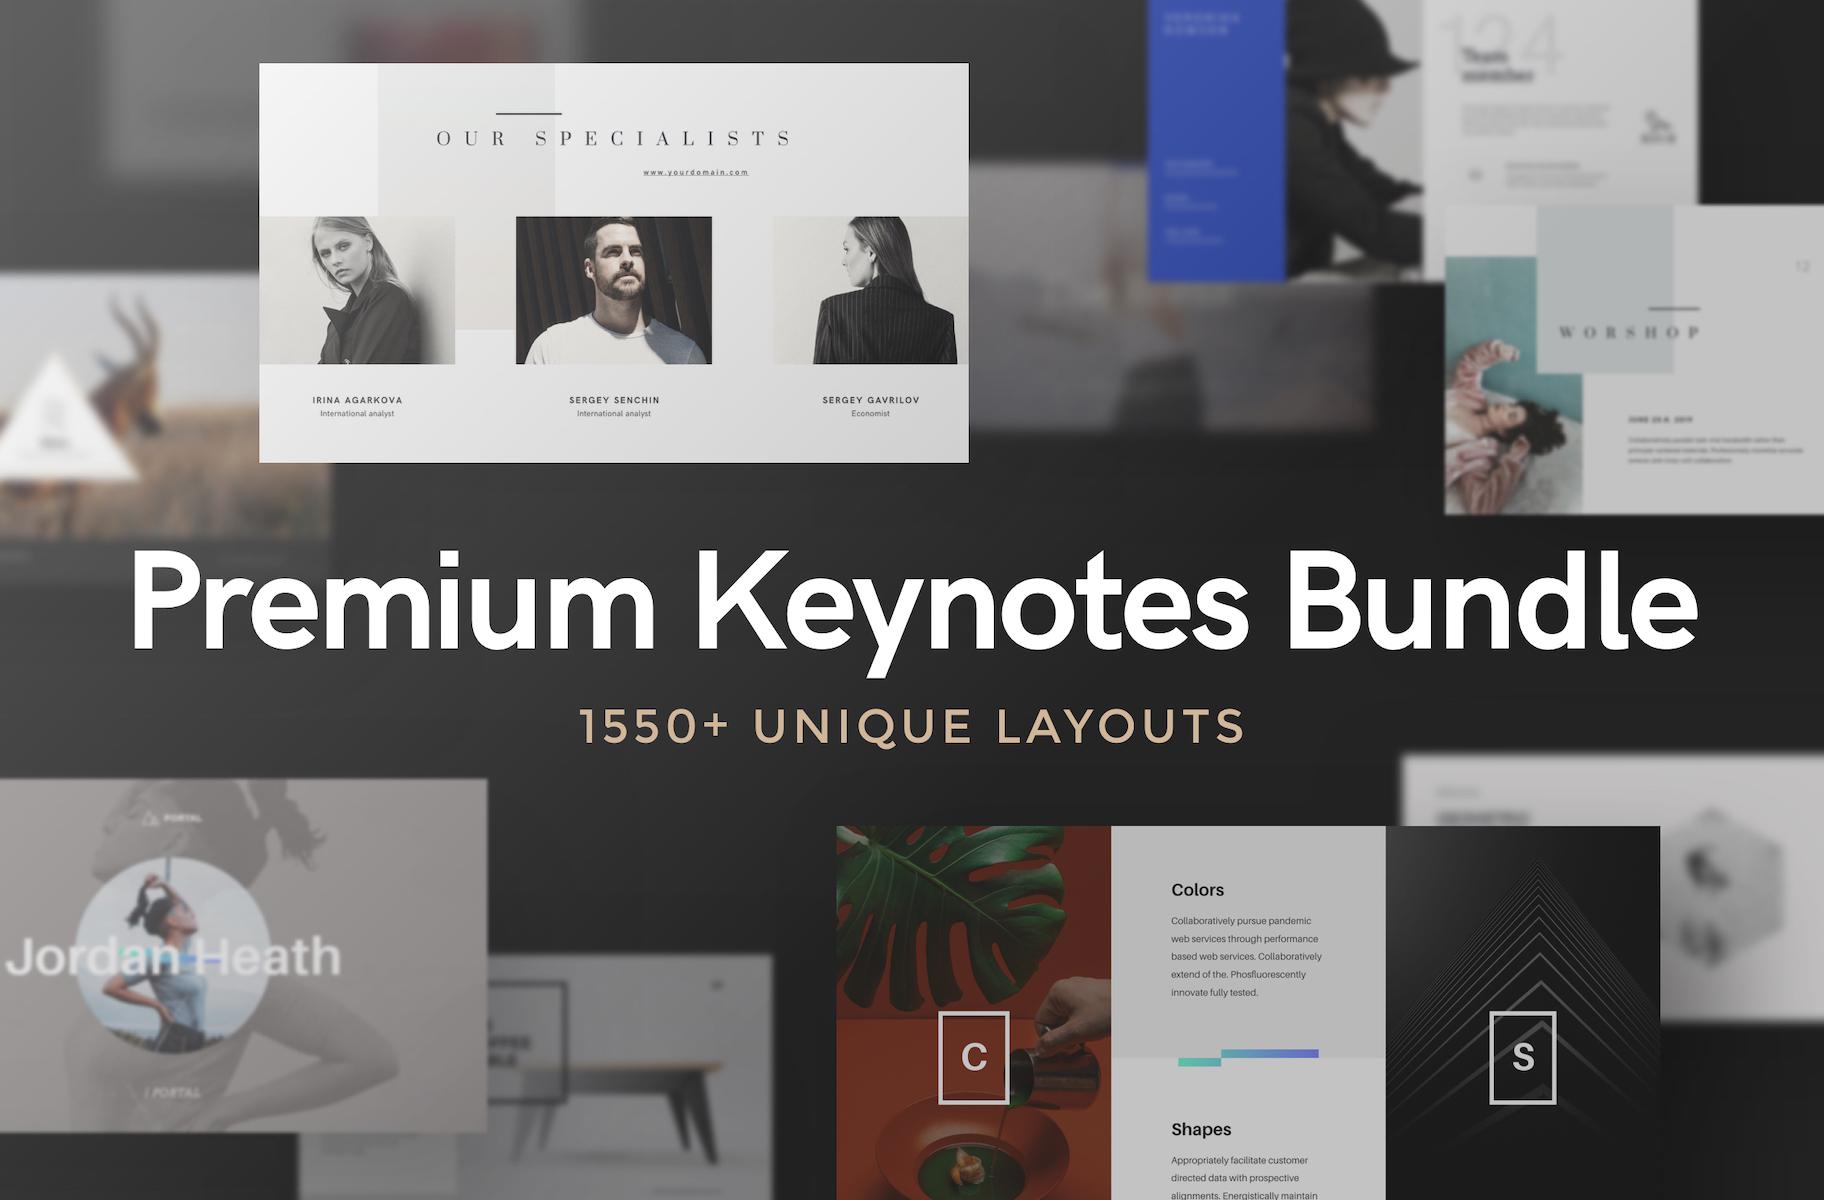 Premium keynotes by goashape cover copy